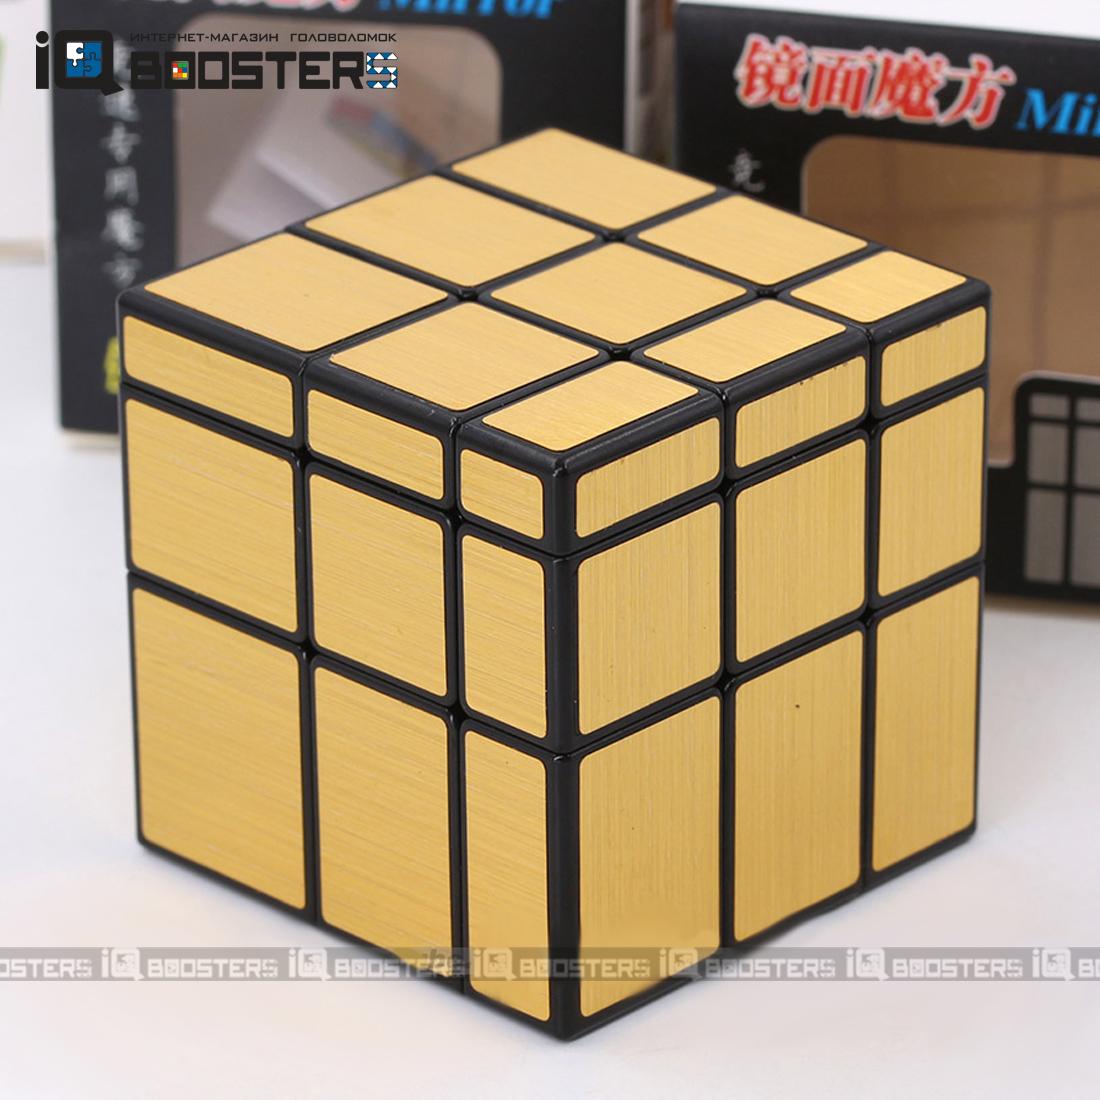 qiyi_mirror_cube_1g